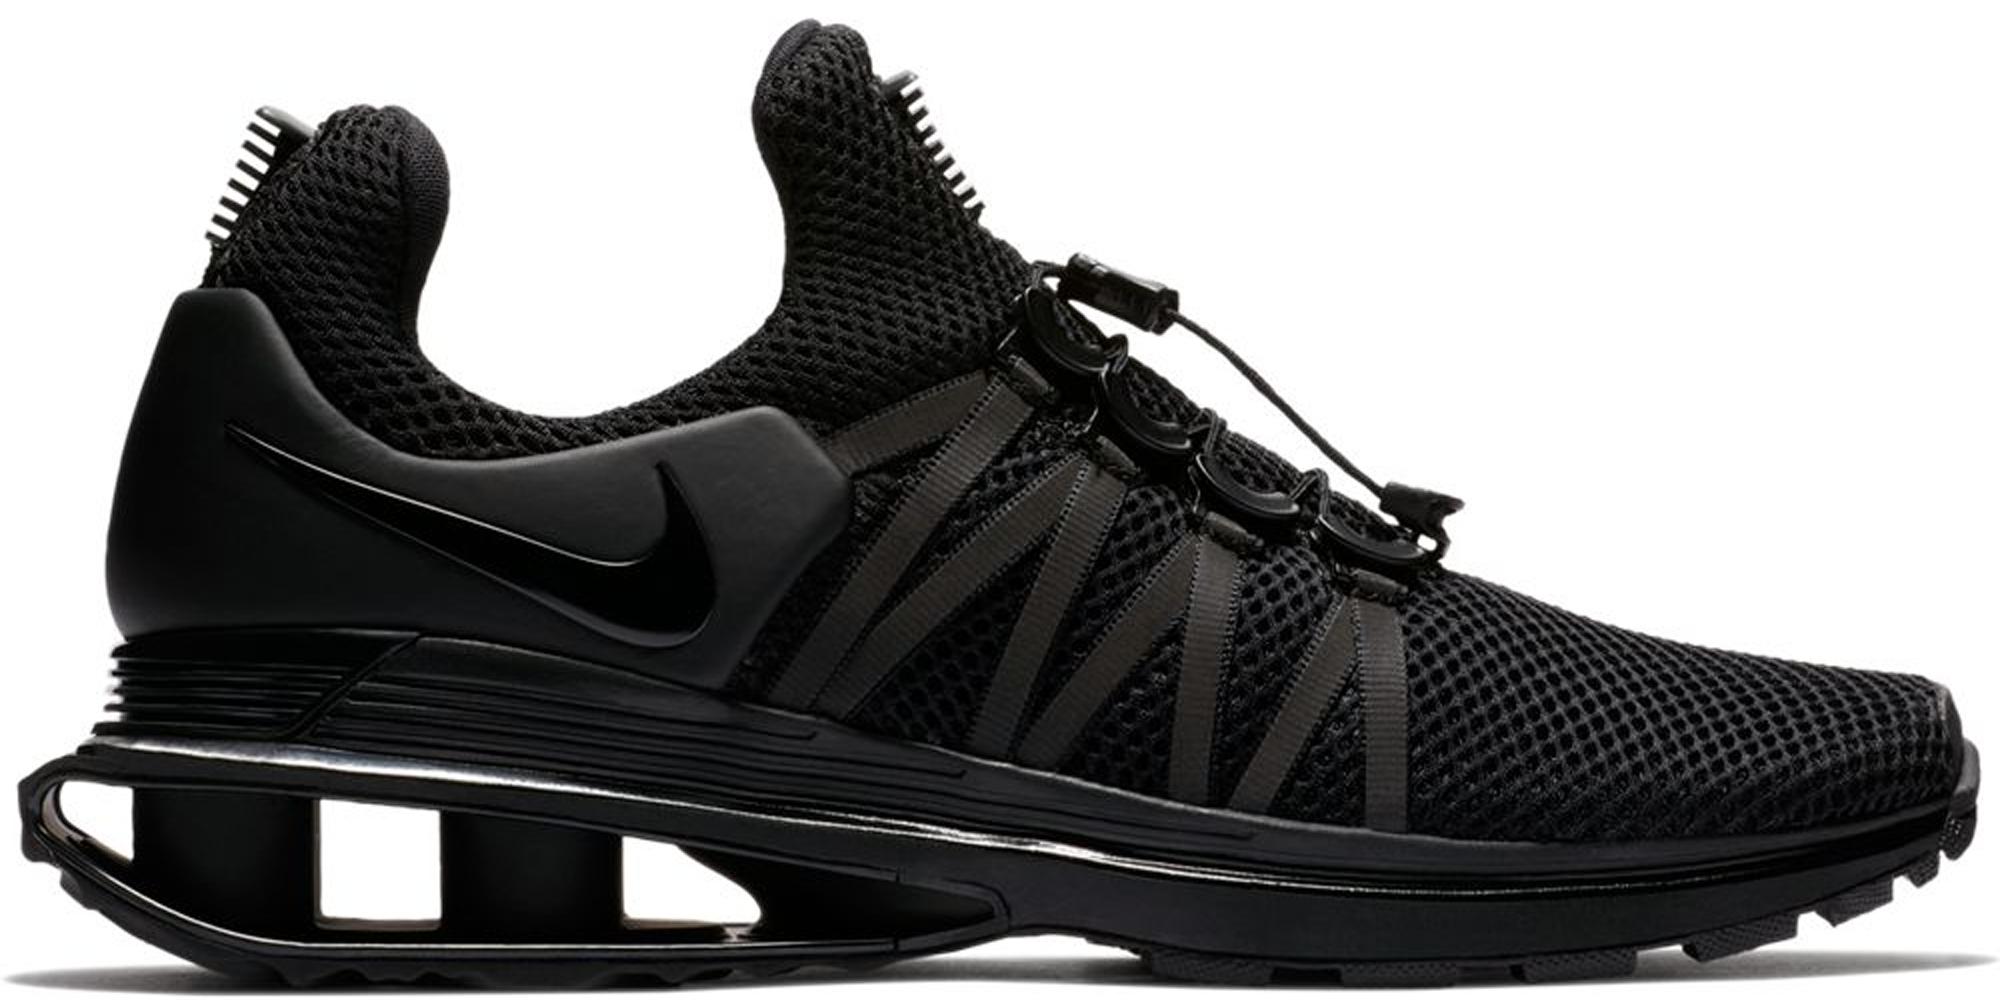 Nike Shox Gravity Triple Black - AR1999-001